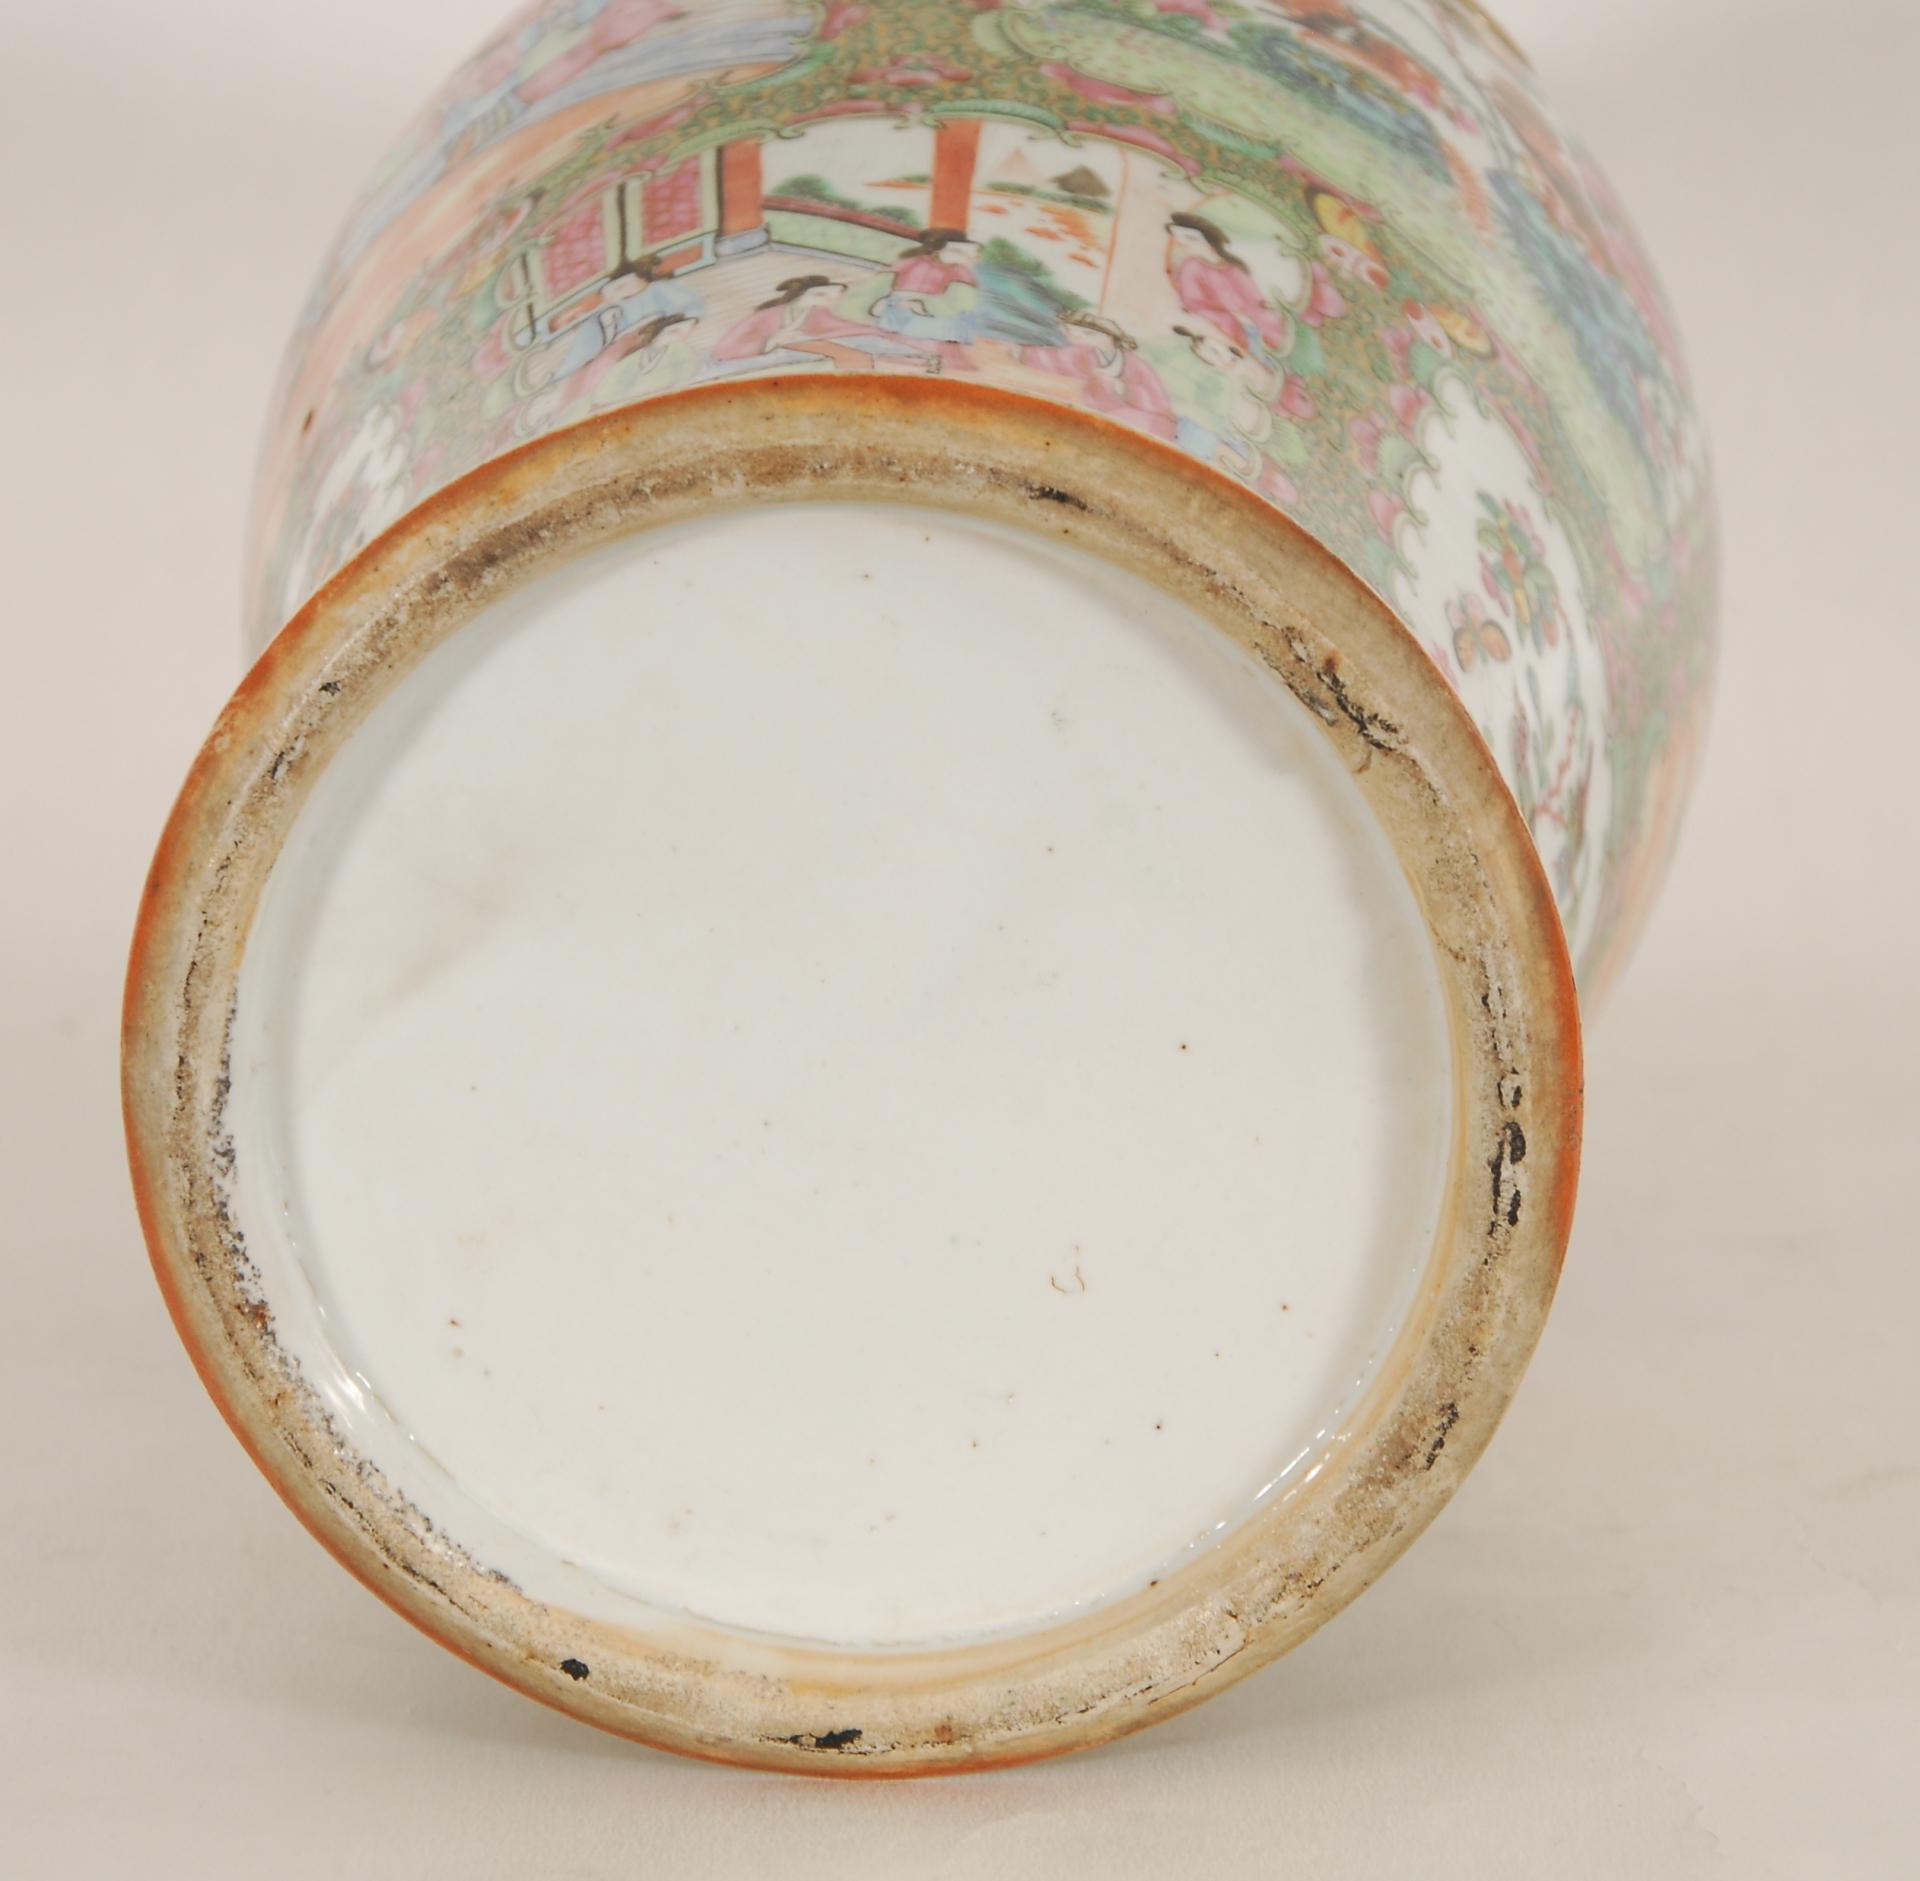 Grand vase balustre couvert